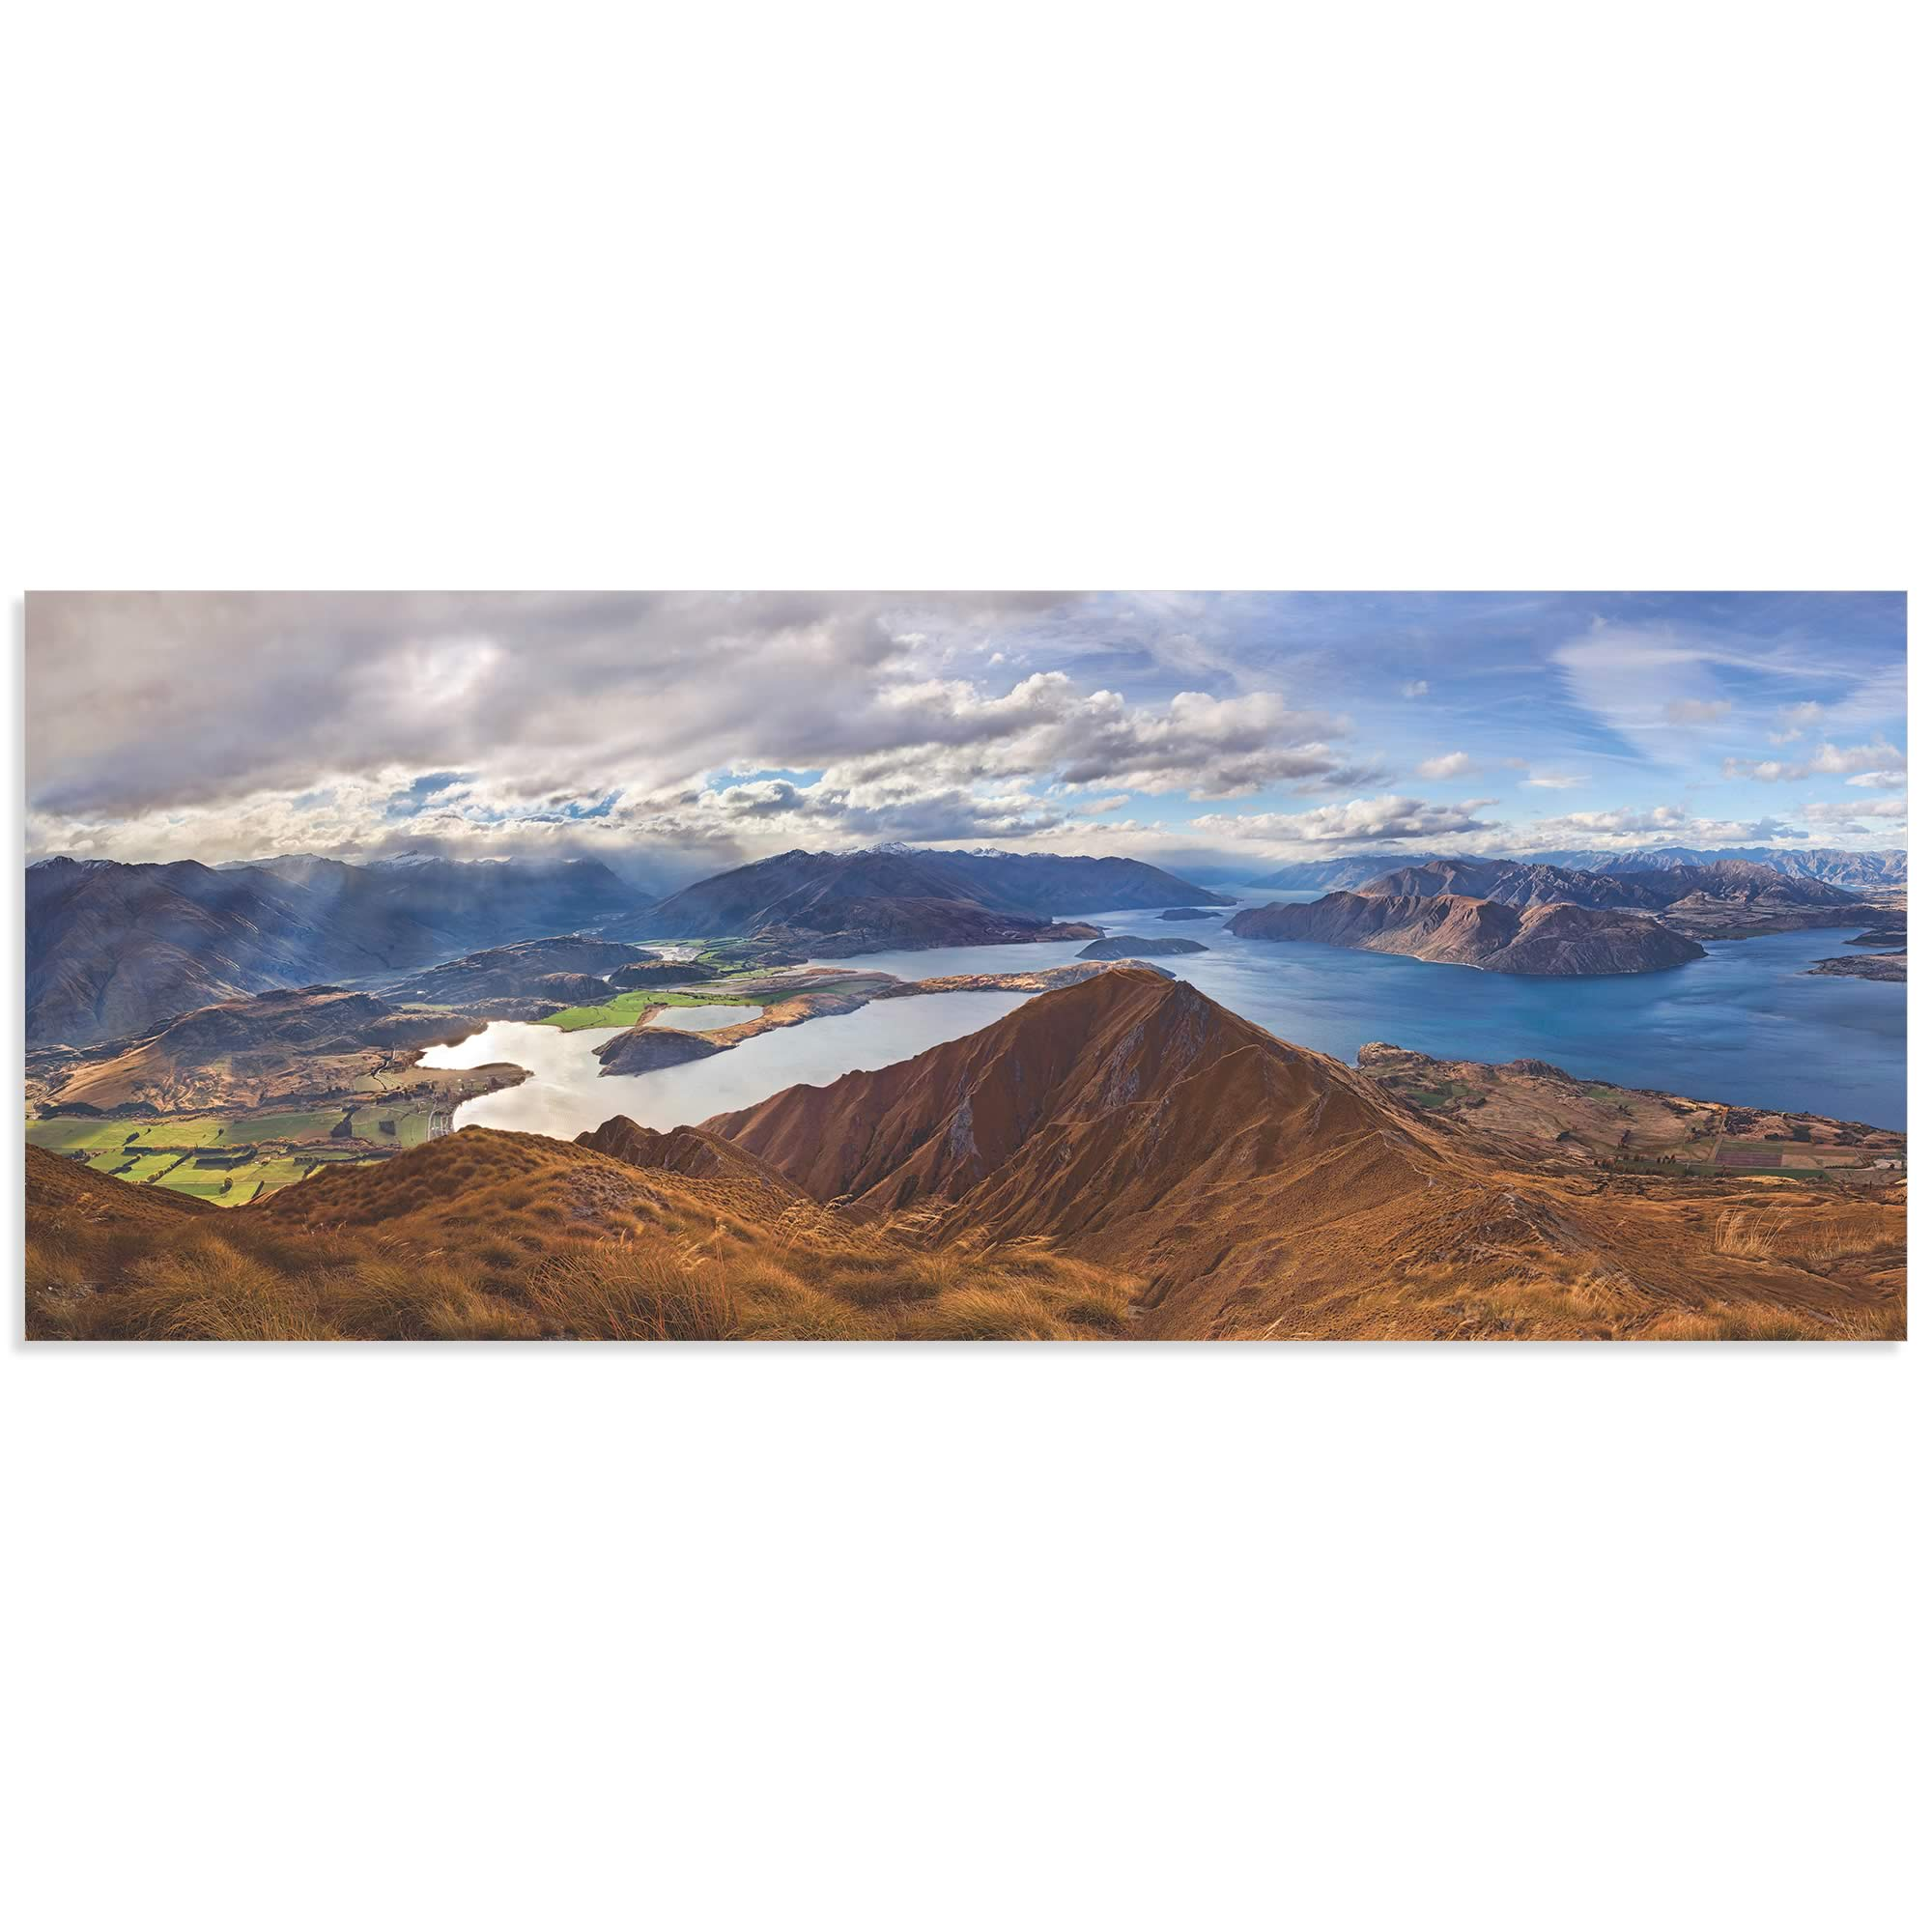 Roys Peak by Yan Zhang - Landscape Art on Metal or Acrylic